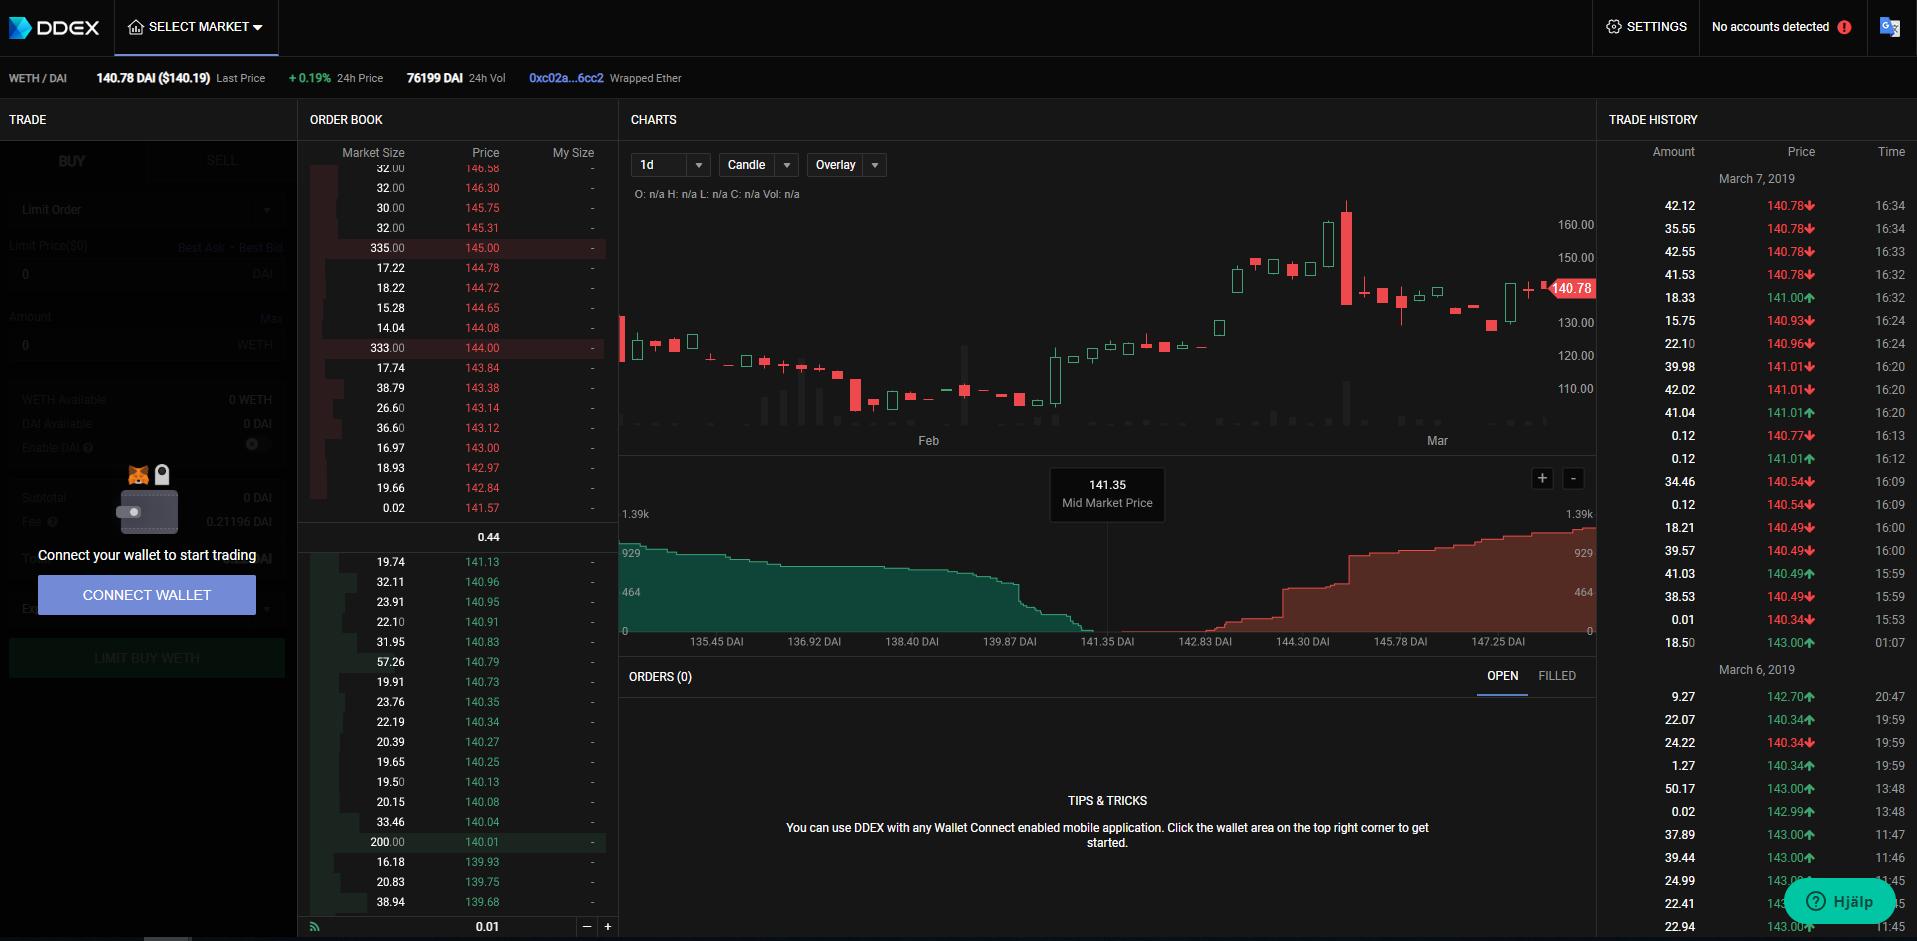 DDEX Trading View